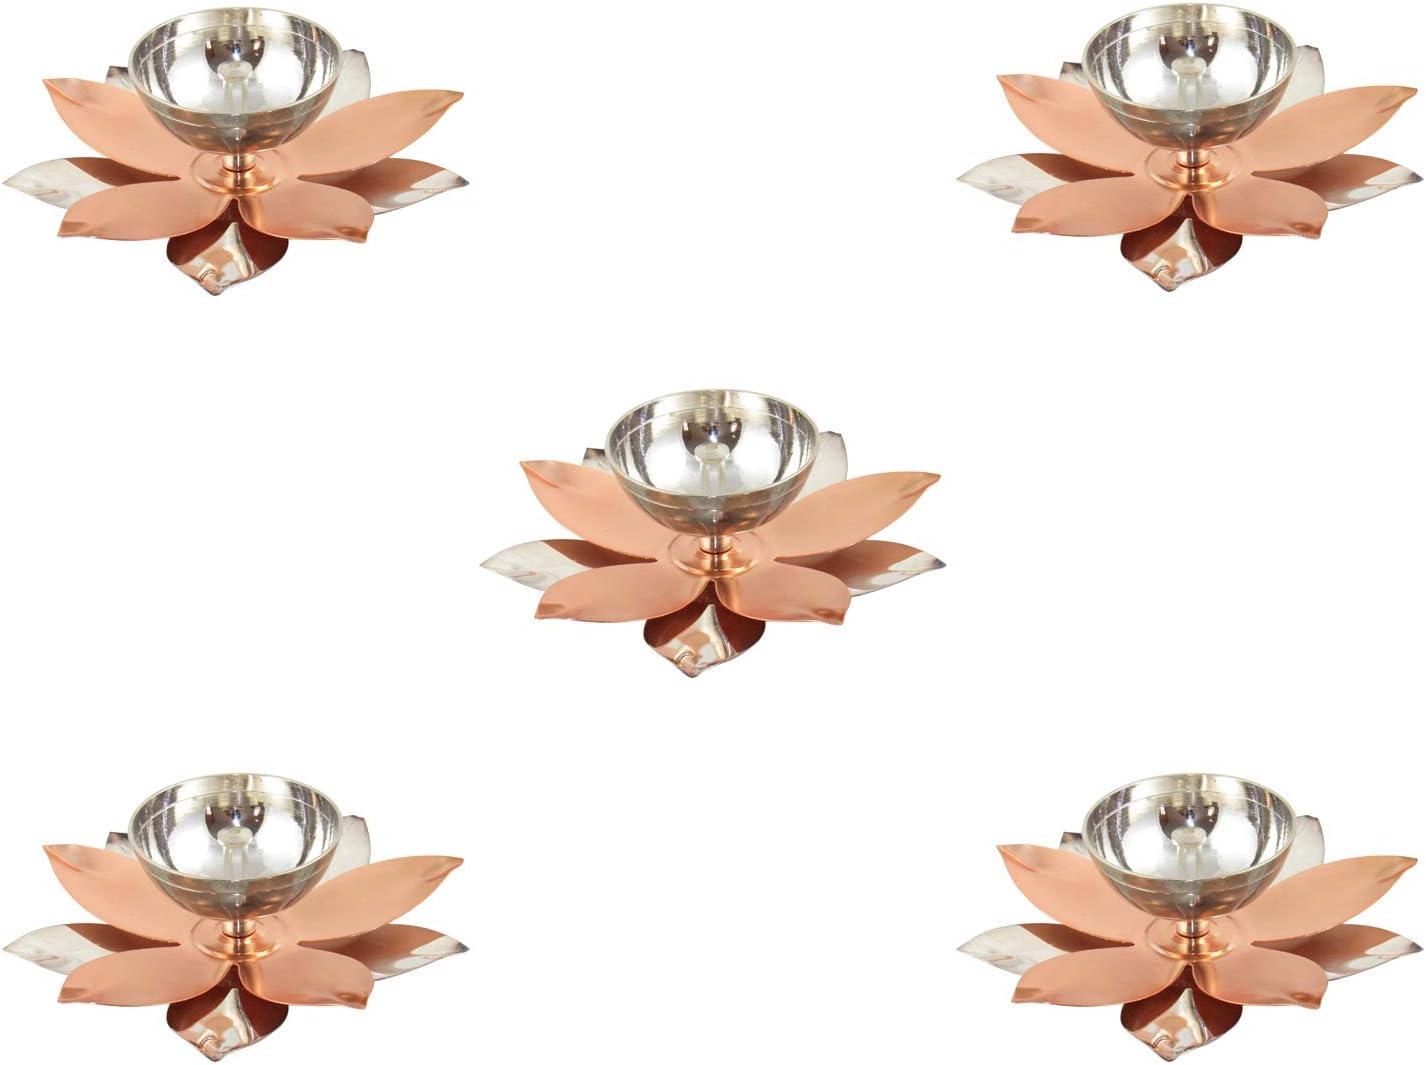 GoldGiftIdeas Copper Lotus Shape Diya for Pooja, Brass Pooja Articles for Gift, Return Gift for Housewarming, Hindu Religious Oil Lamp for Home Decor Pack of 5 18 cm